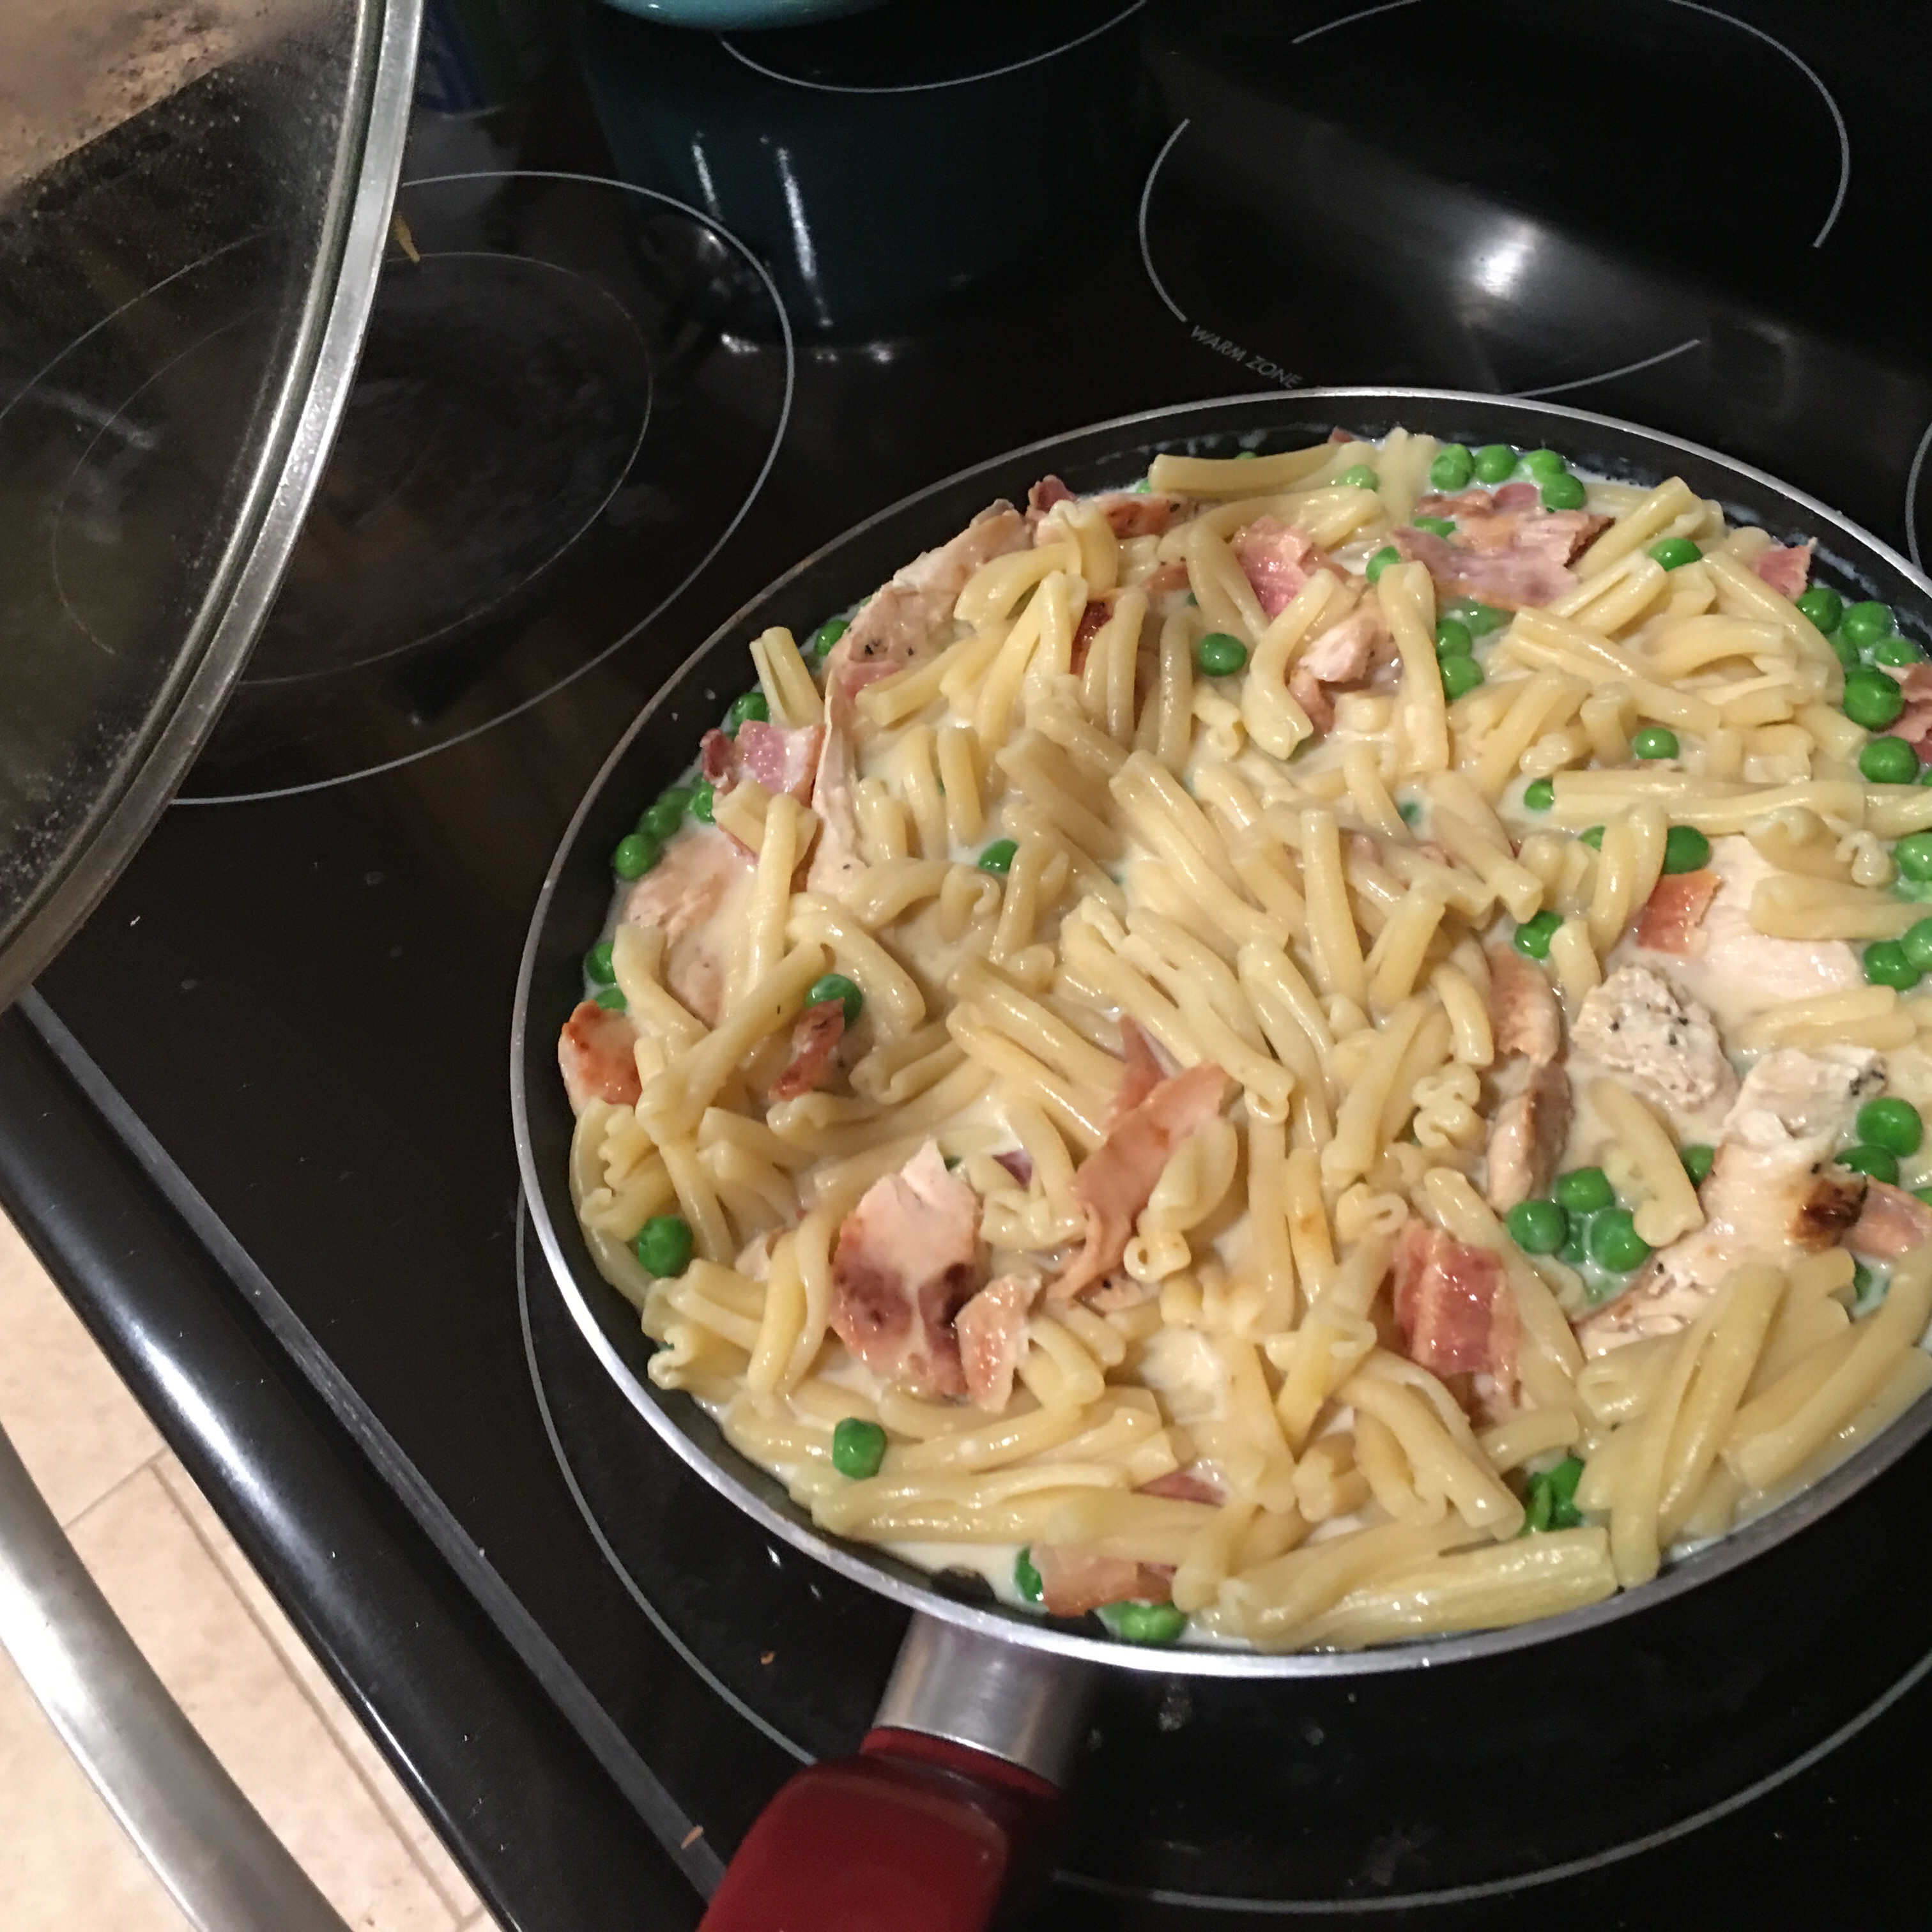 Chicken Carbonara Risotto mattyice25